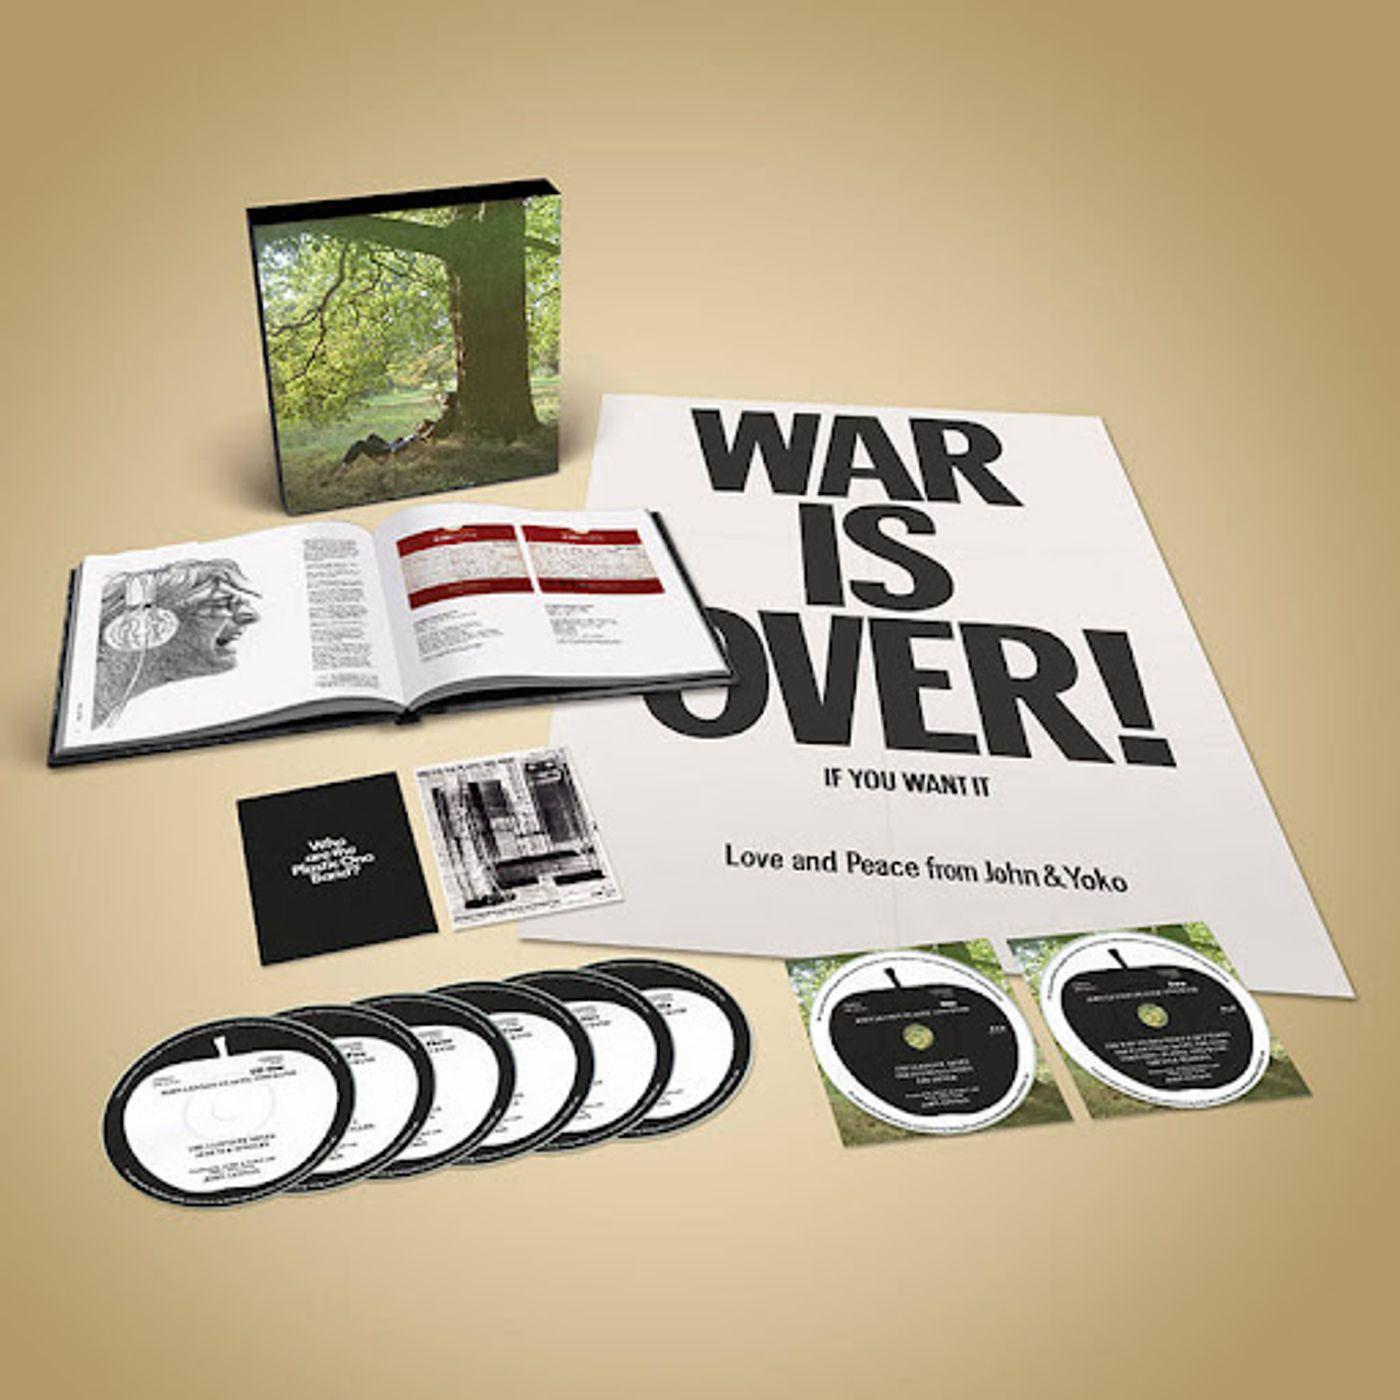 ESPECIAL JOHN LENNON PLASTIC ONO BAND Pt02 #avengers #wahtif #shadowsfx #venom2 #venom #shangchi #doompatrol #scream #thebatman